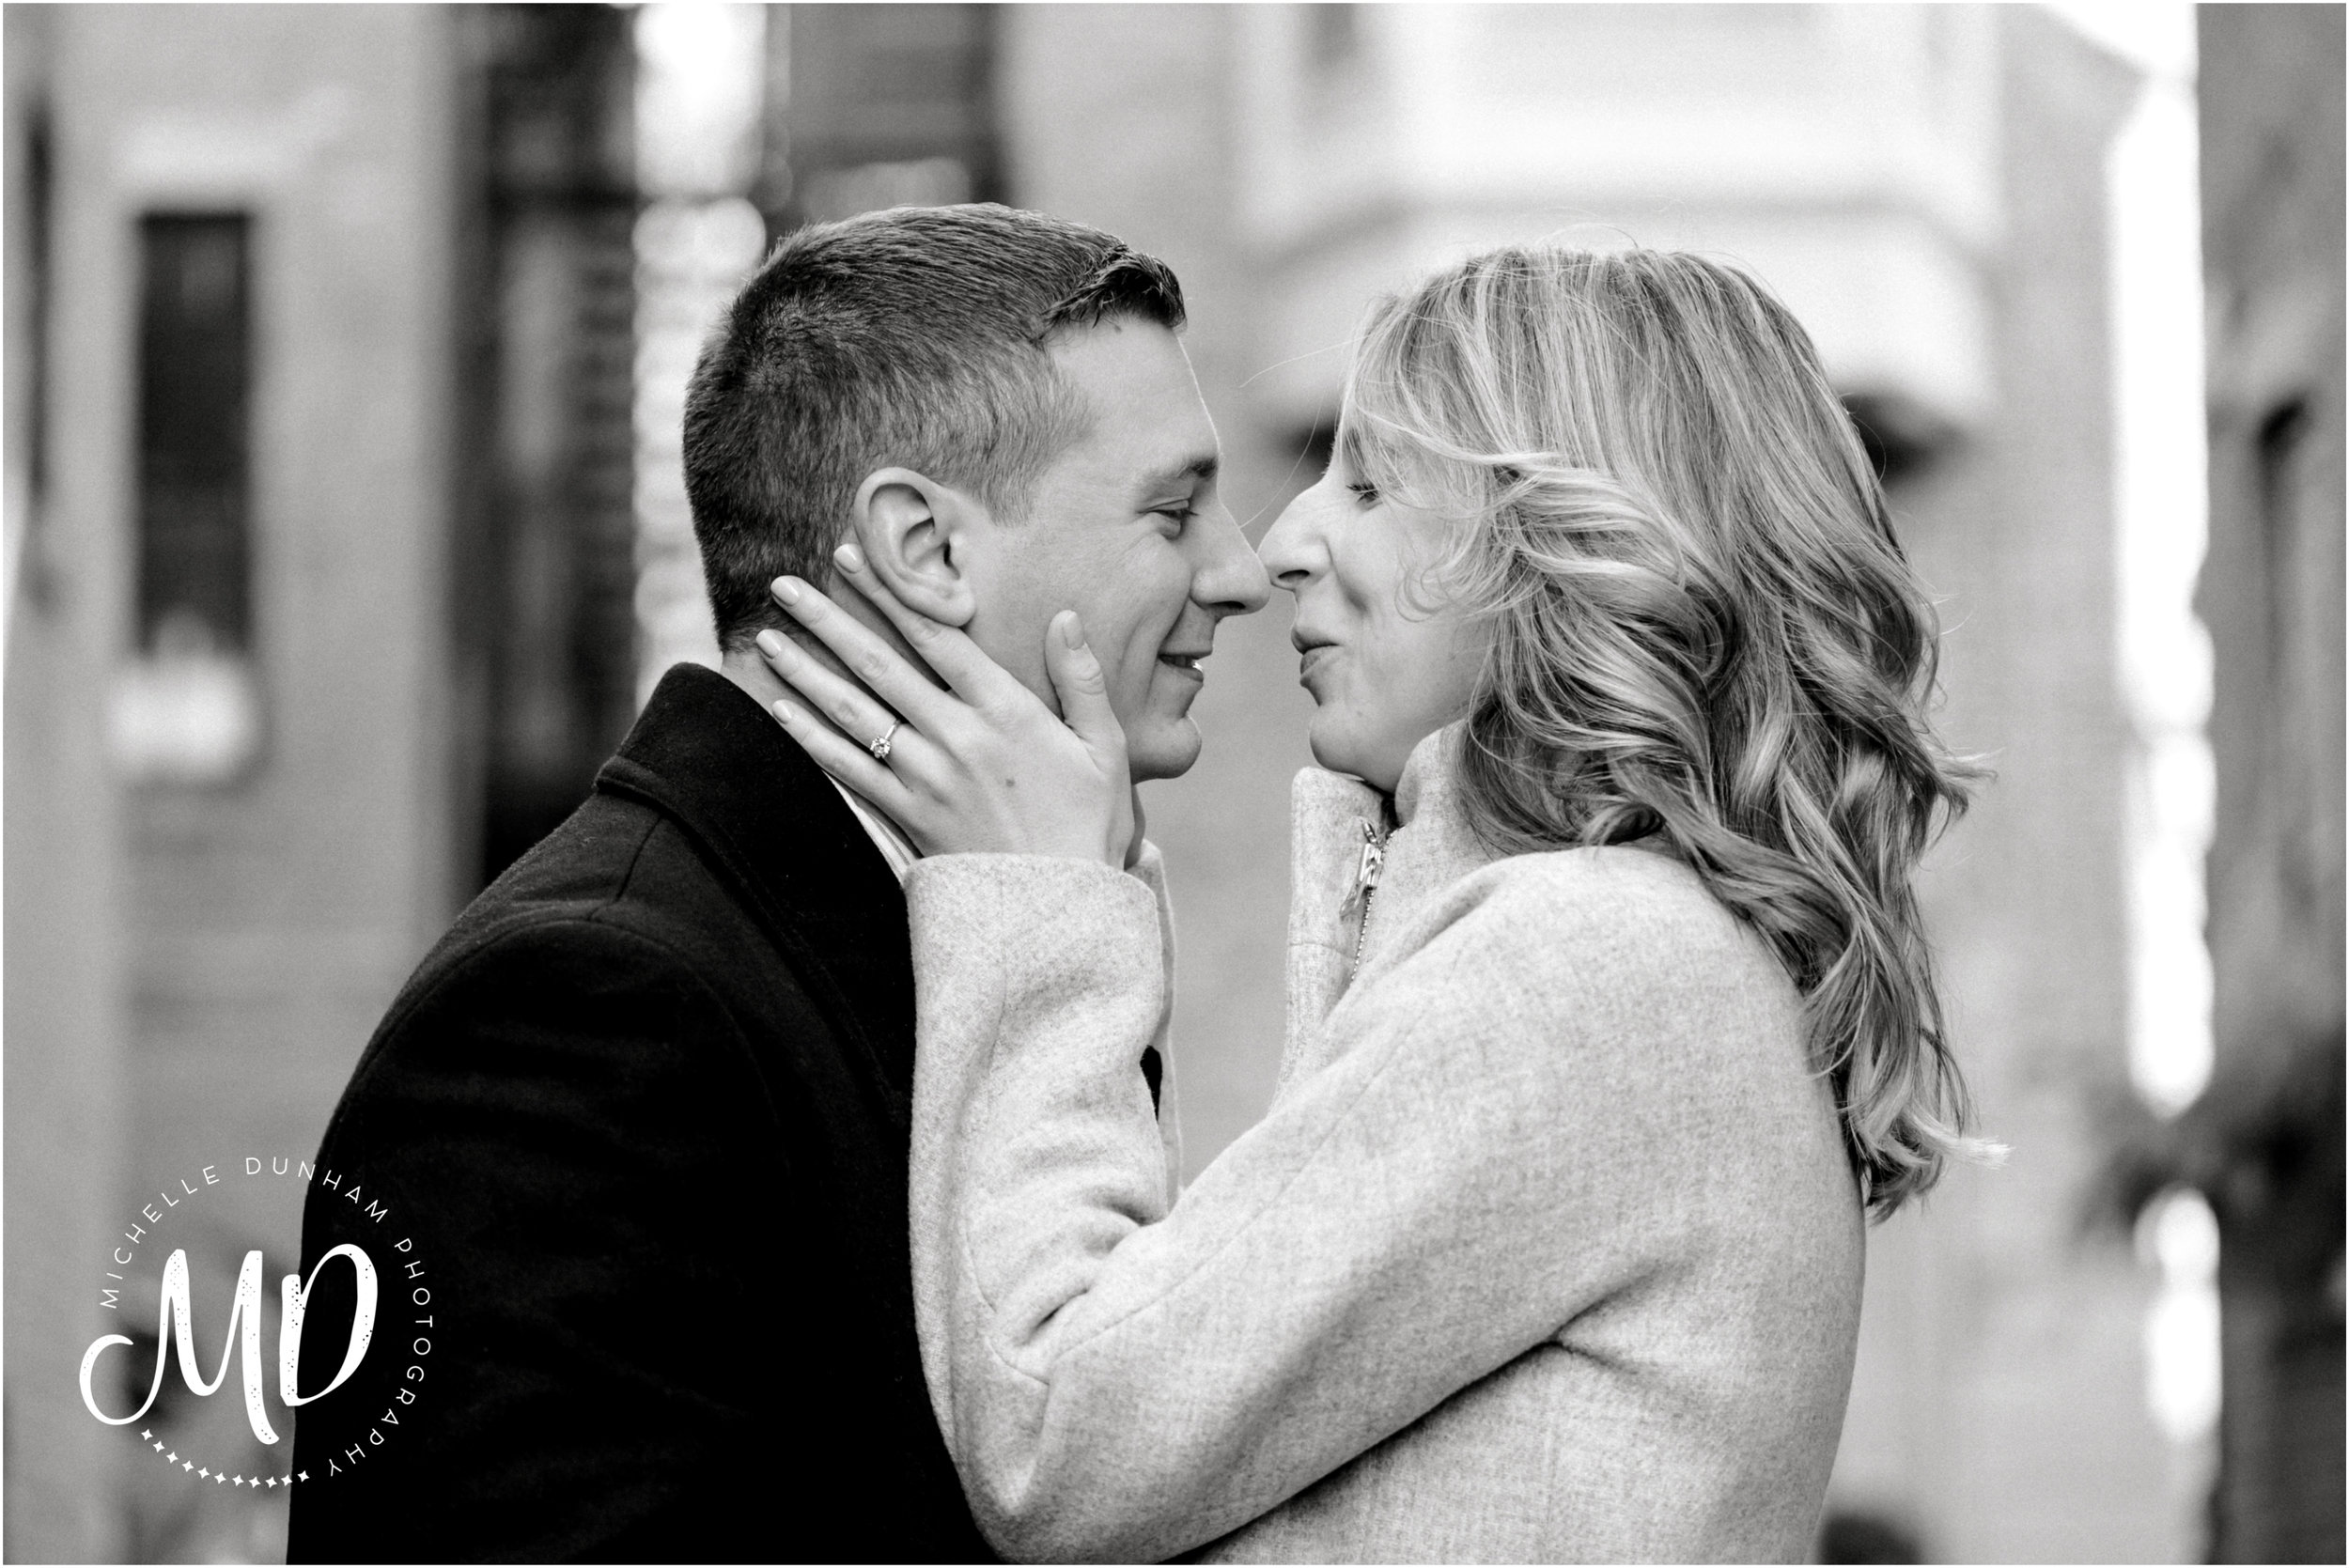 Michelle-Dunham-Photography-Beacon-Hill-Engagement-26.jpg